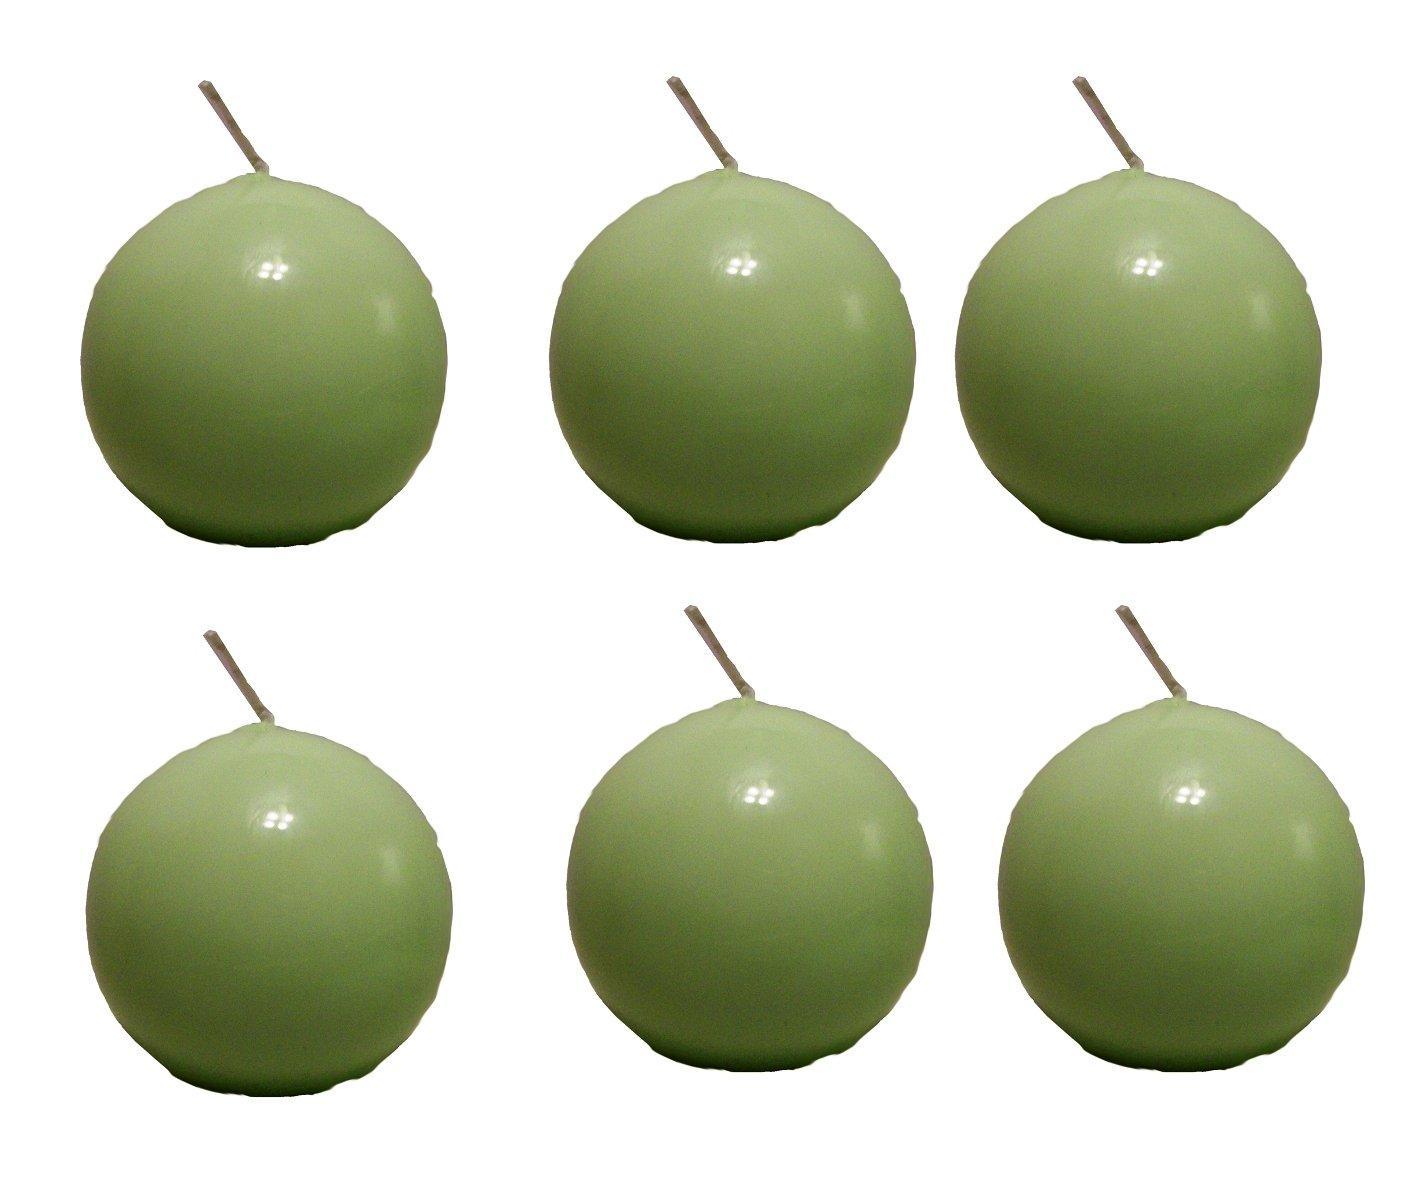 Biedermann & Sons 2-3/4-Inch Round Candles, Daiquiri Green, Set of 6